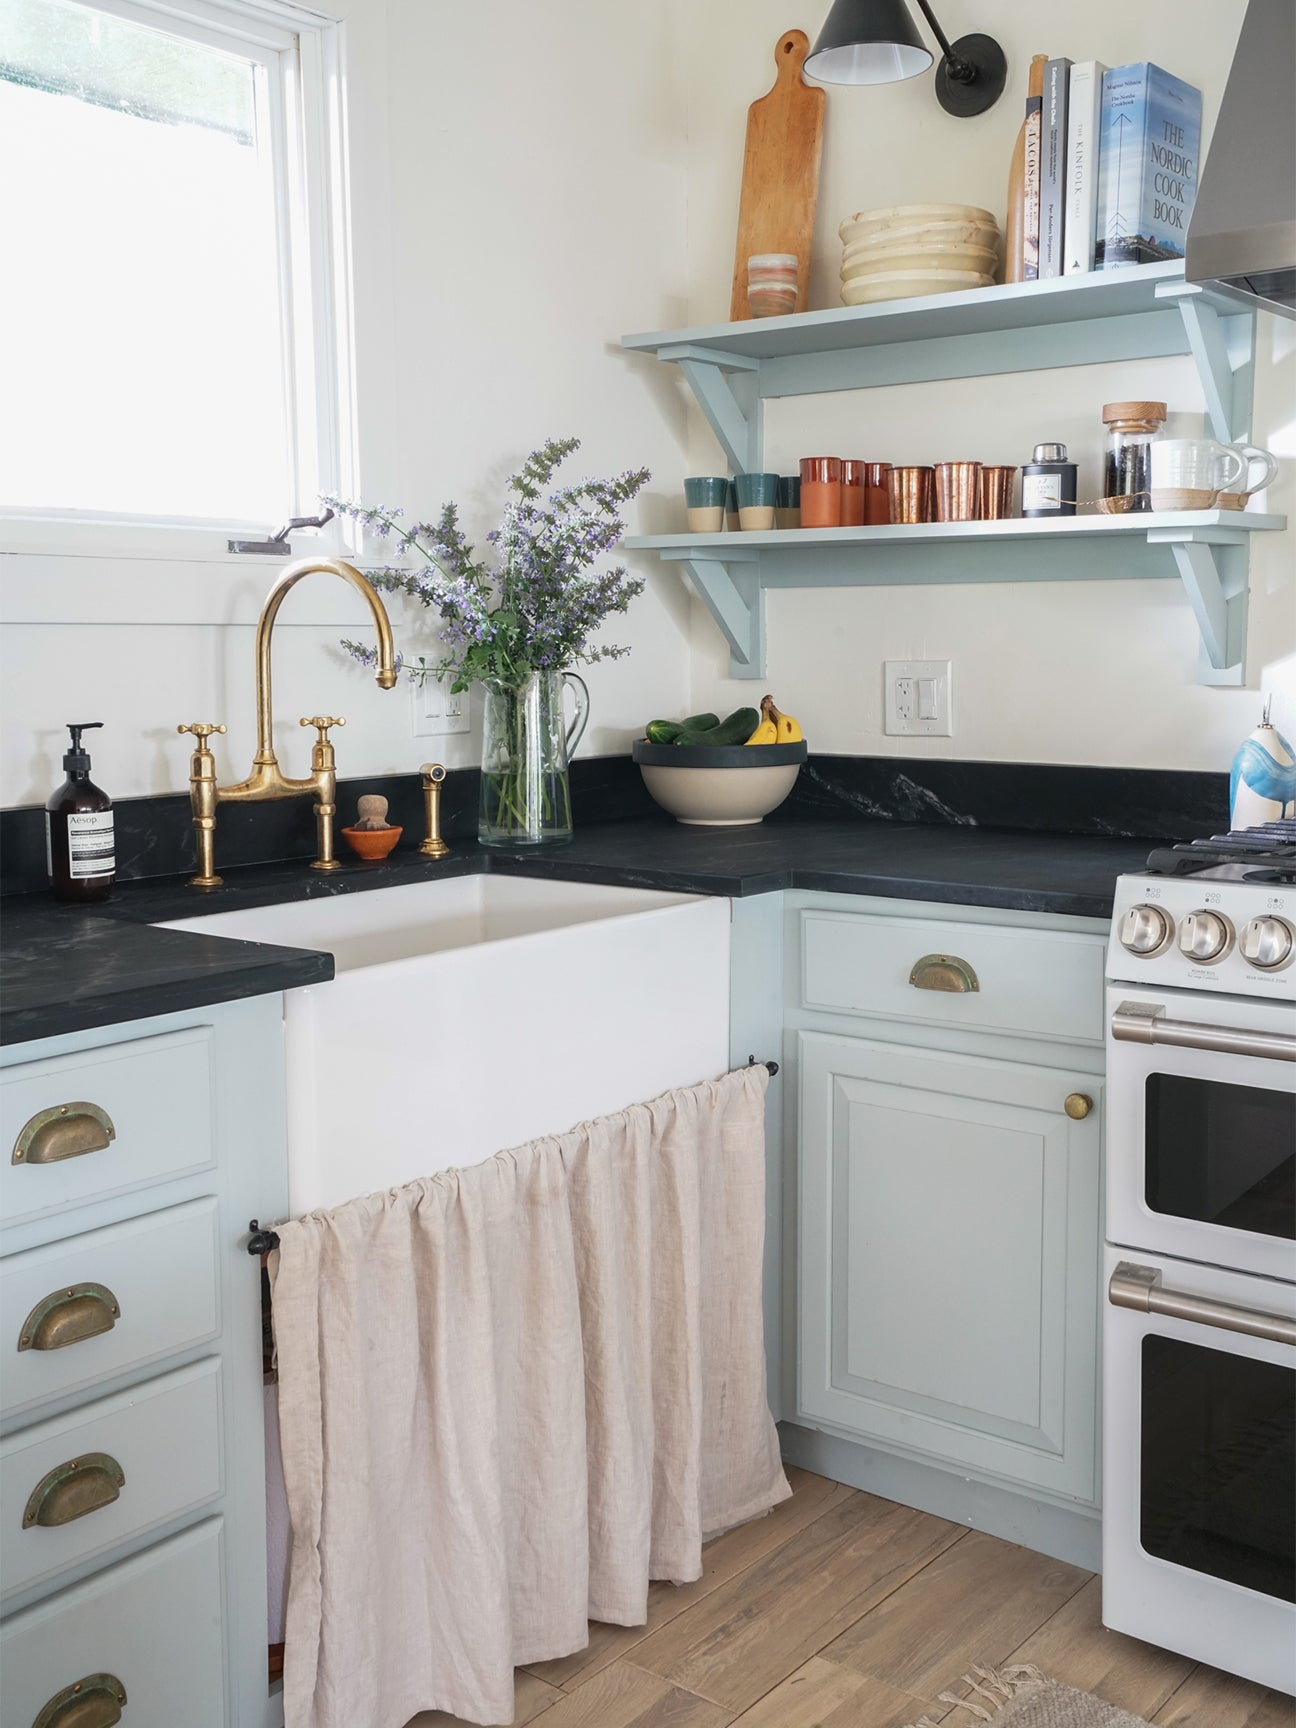 farmhouse kitchen sink with linen curtain below